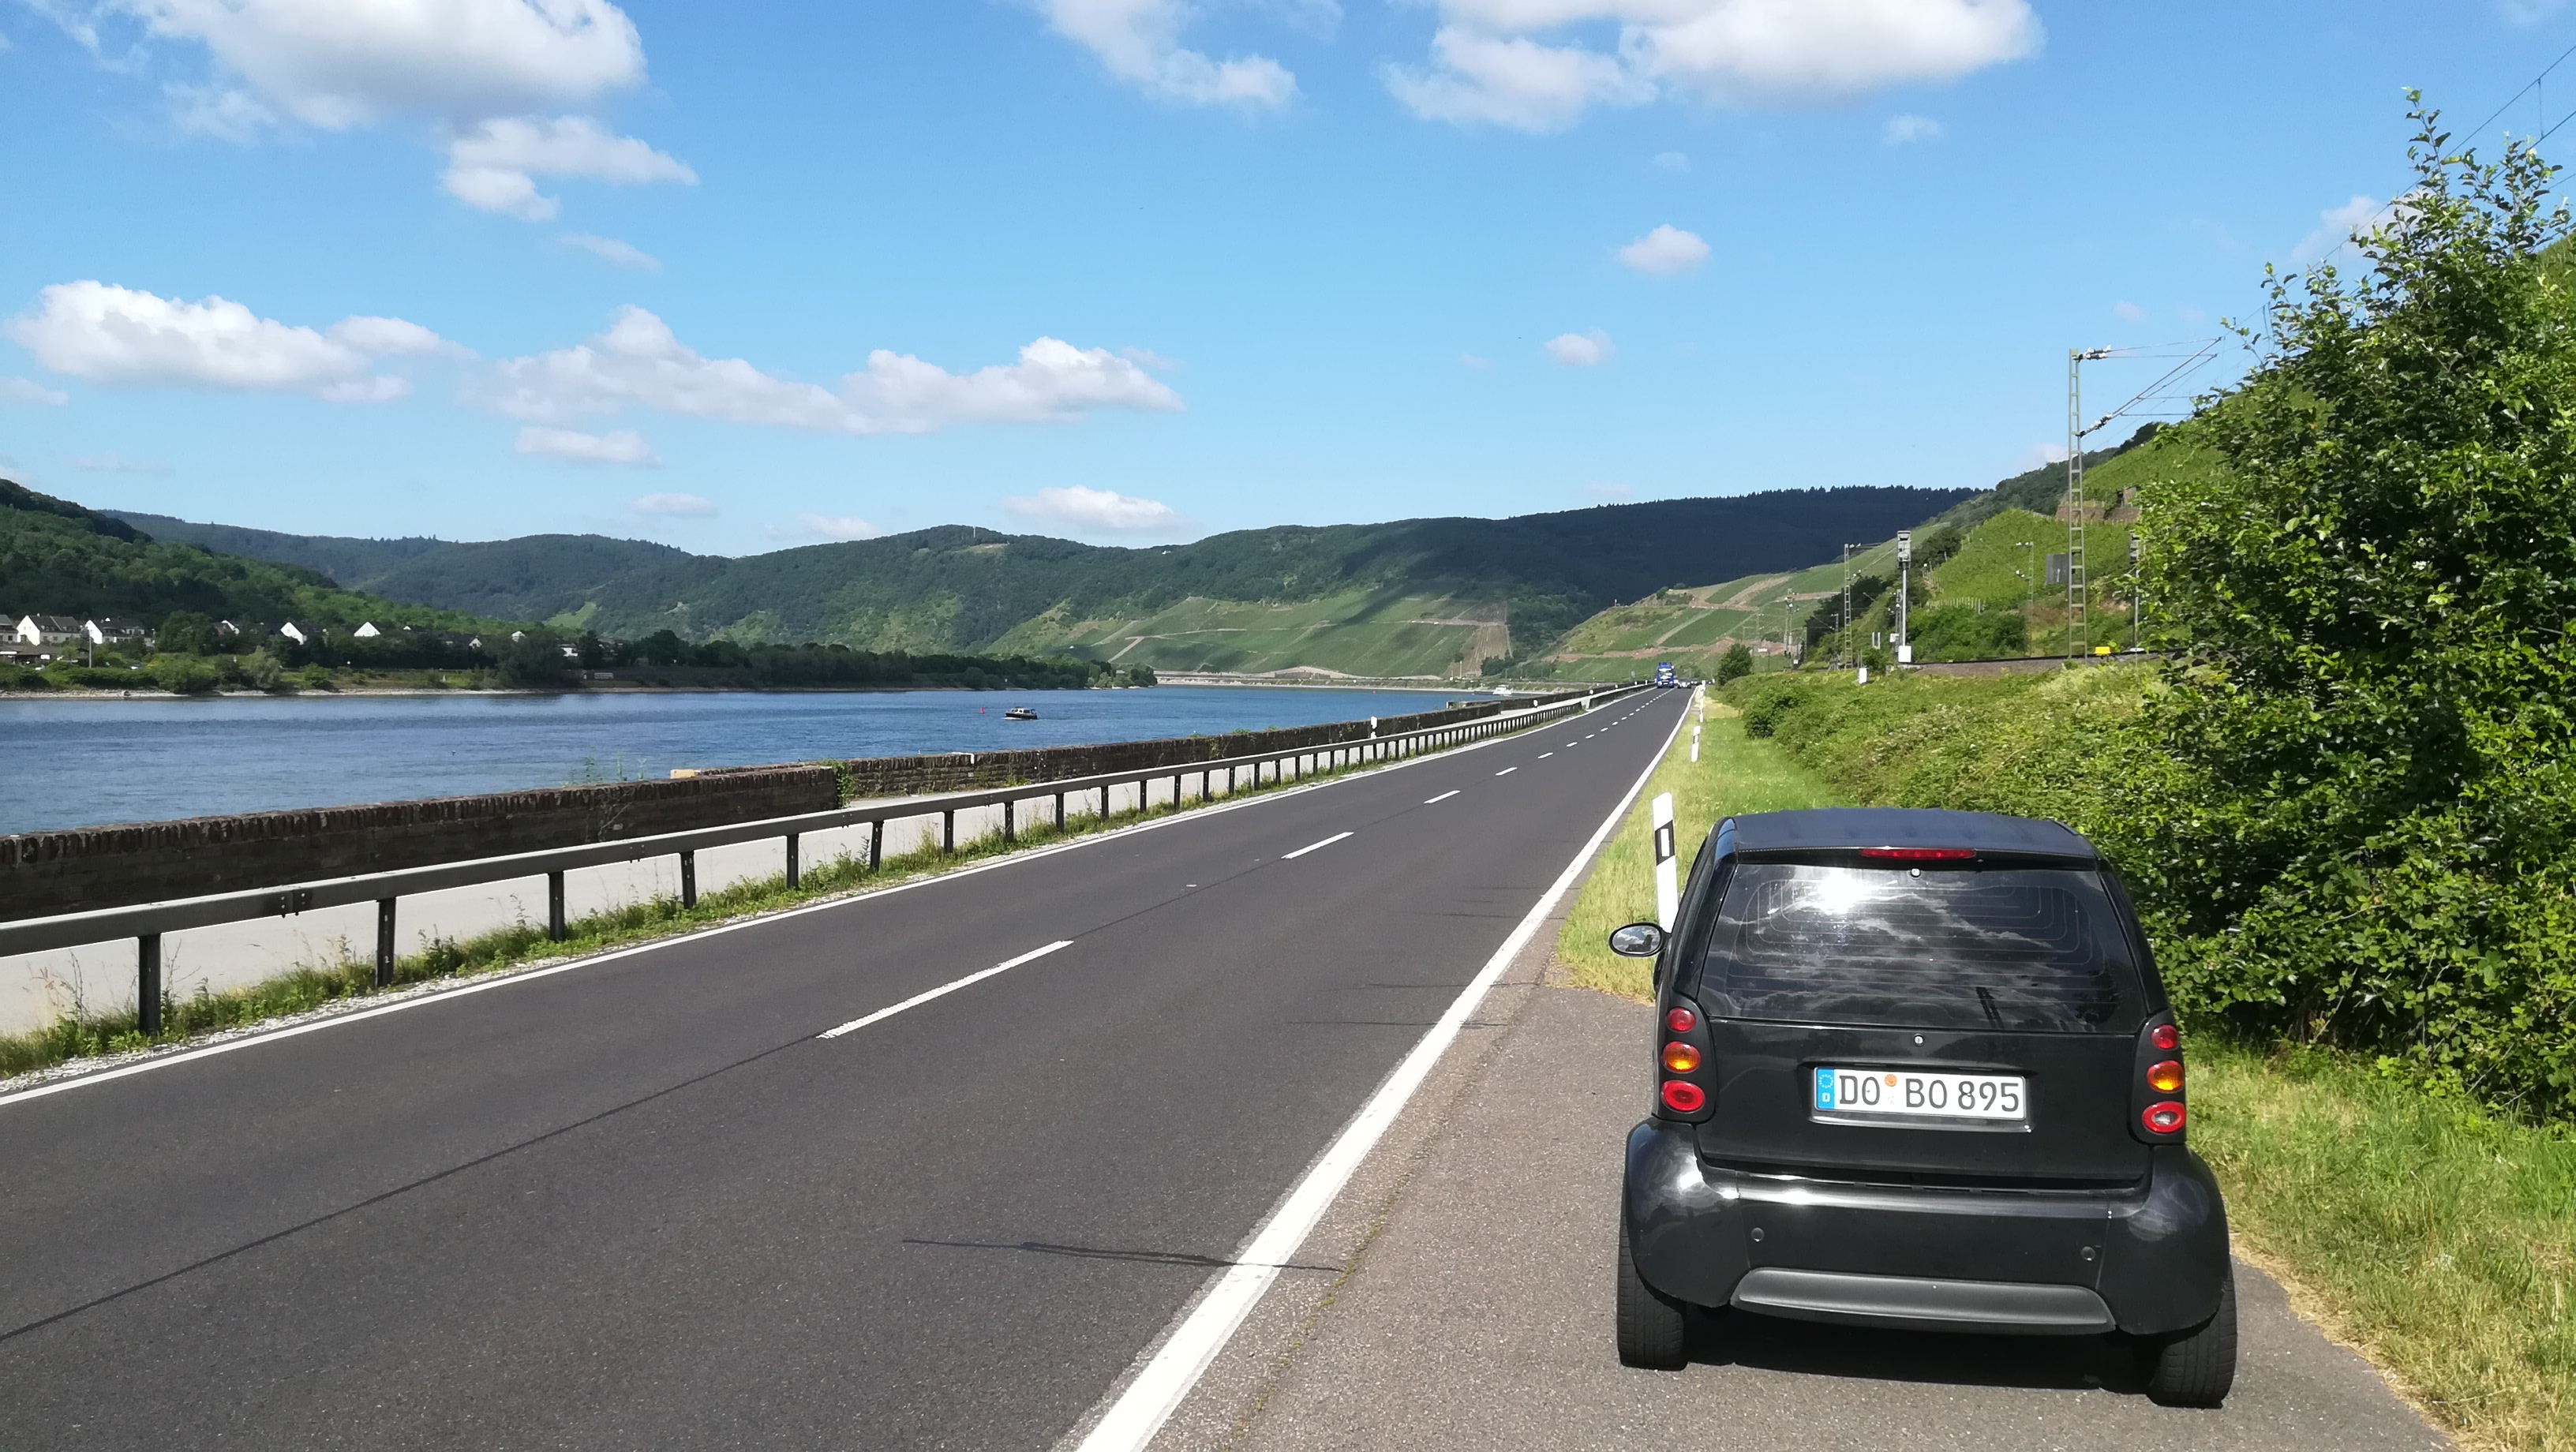 Tour entlang des Rheins Foto: Martin Behrs